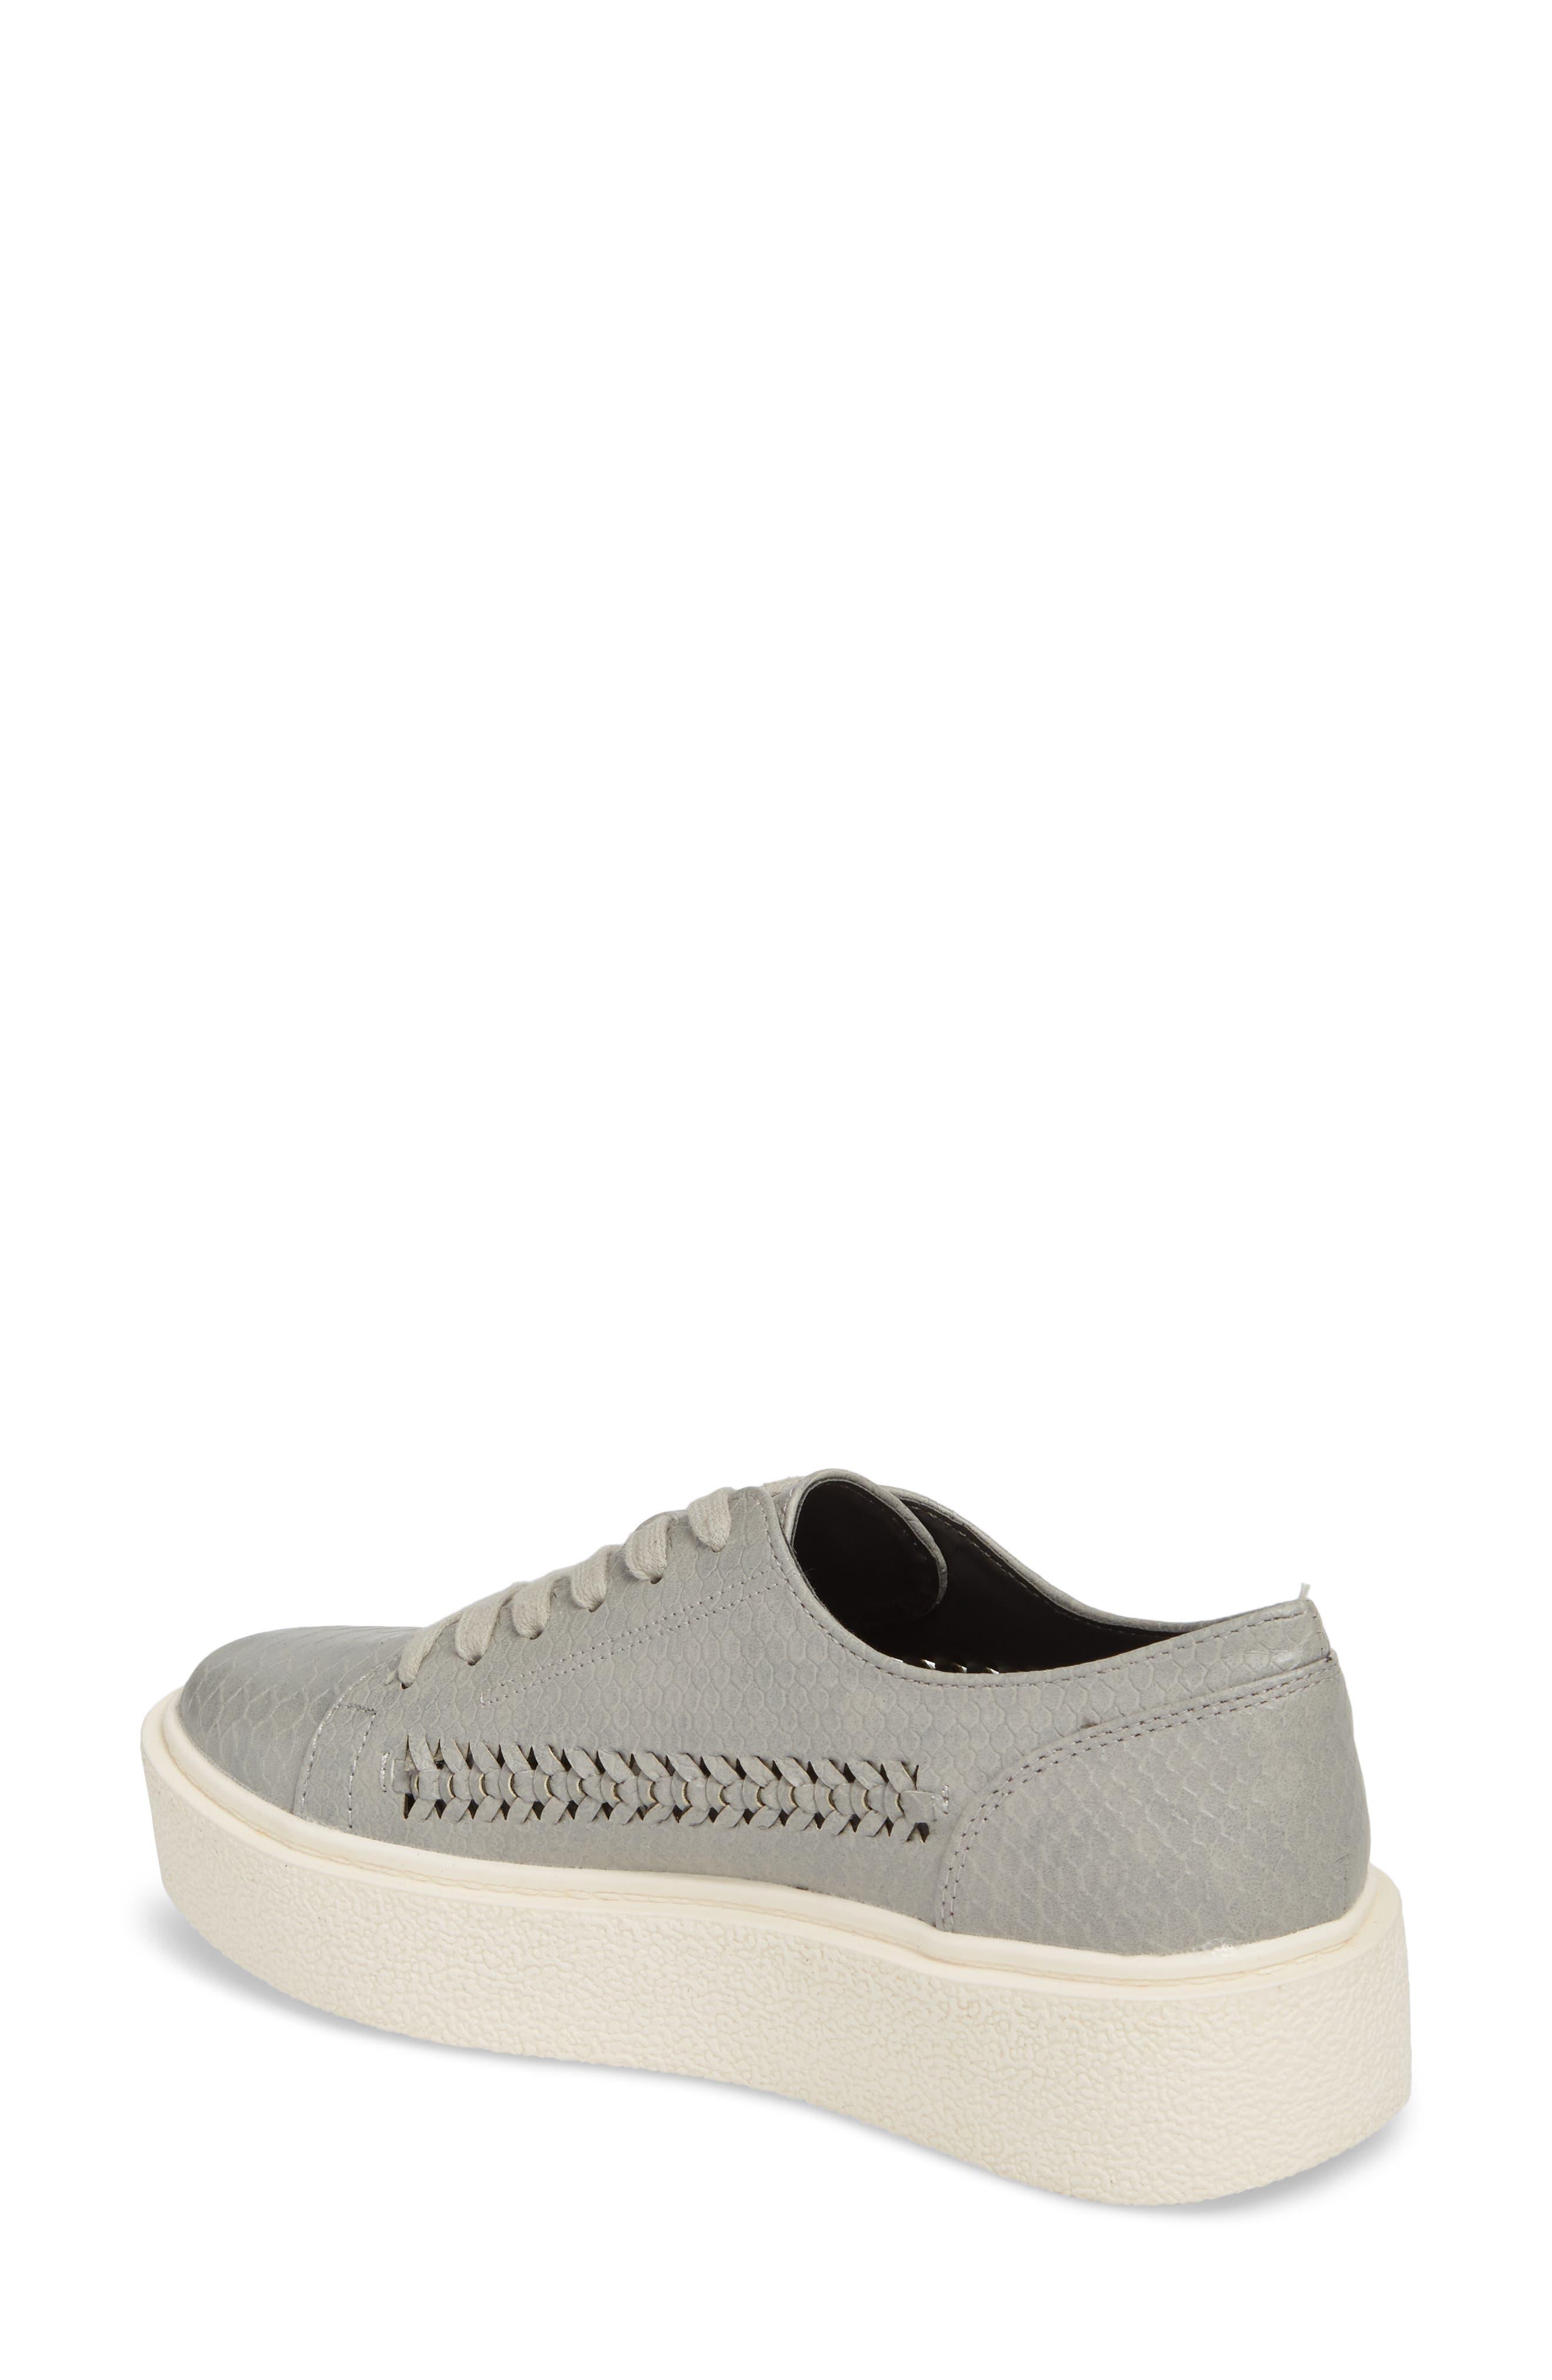 White Out Platform Sneaker,                             Alternate thumbnail 2, color,                             037